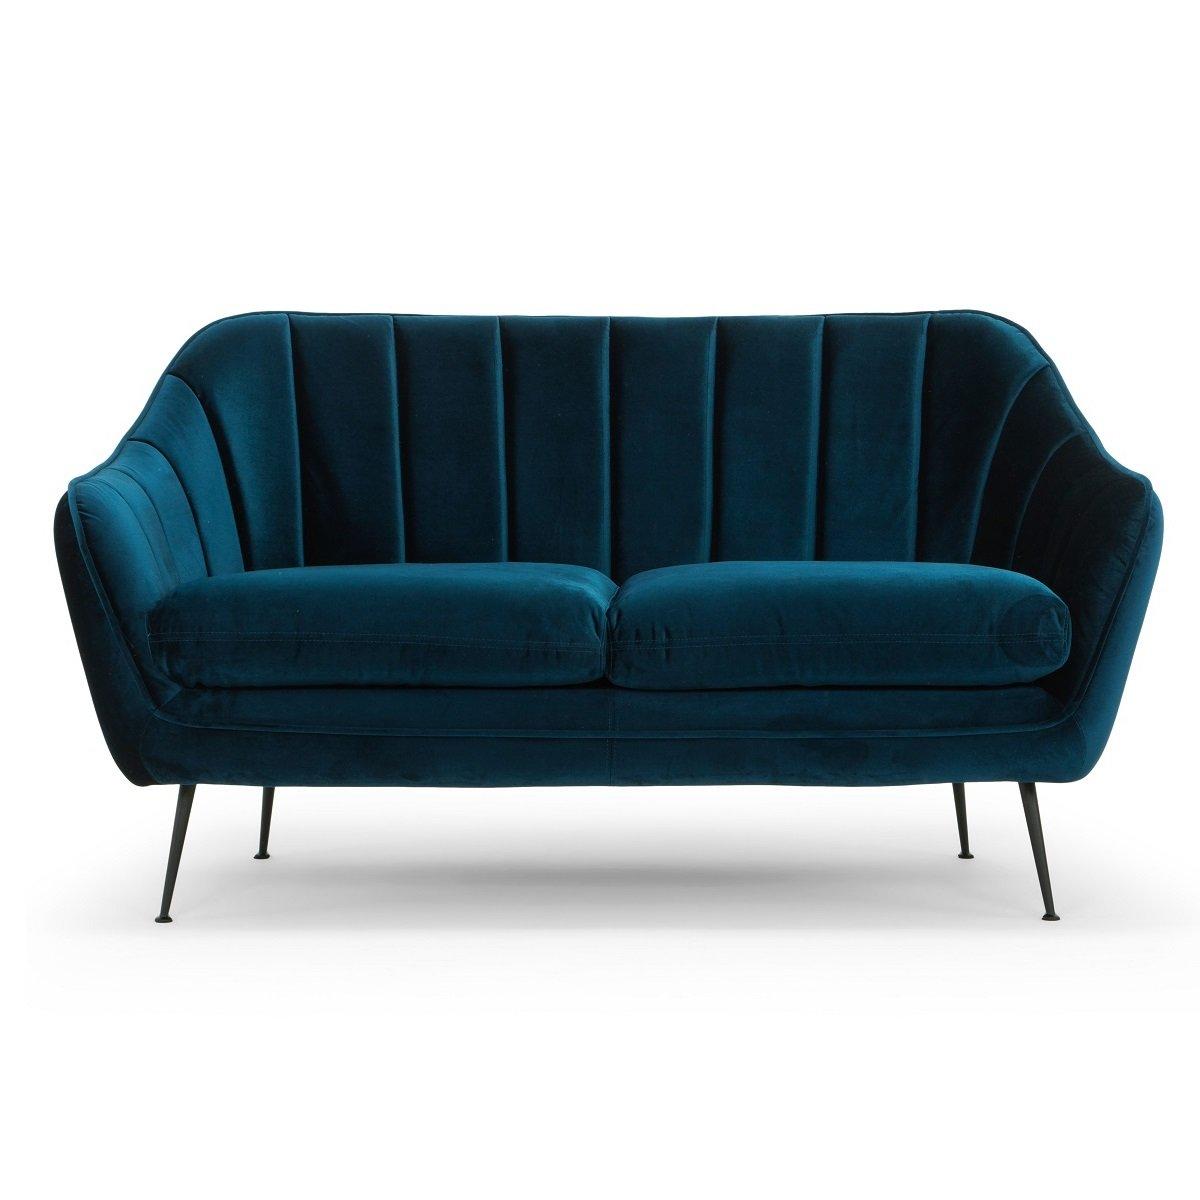 Noah 2 Seater Sofa